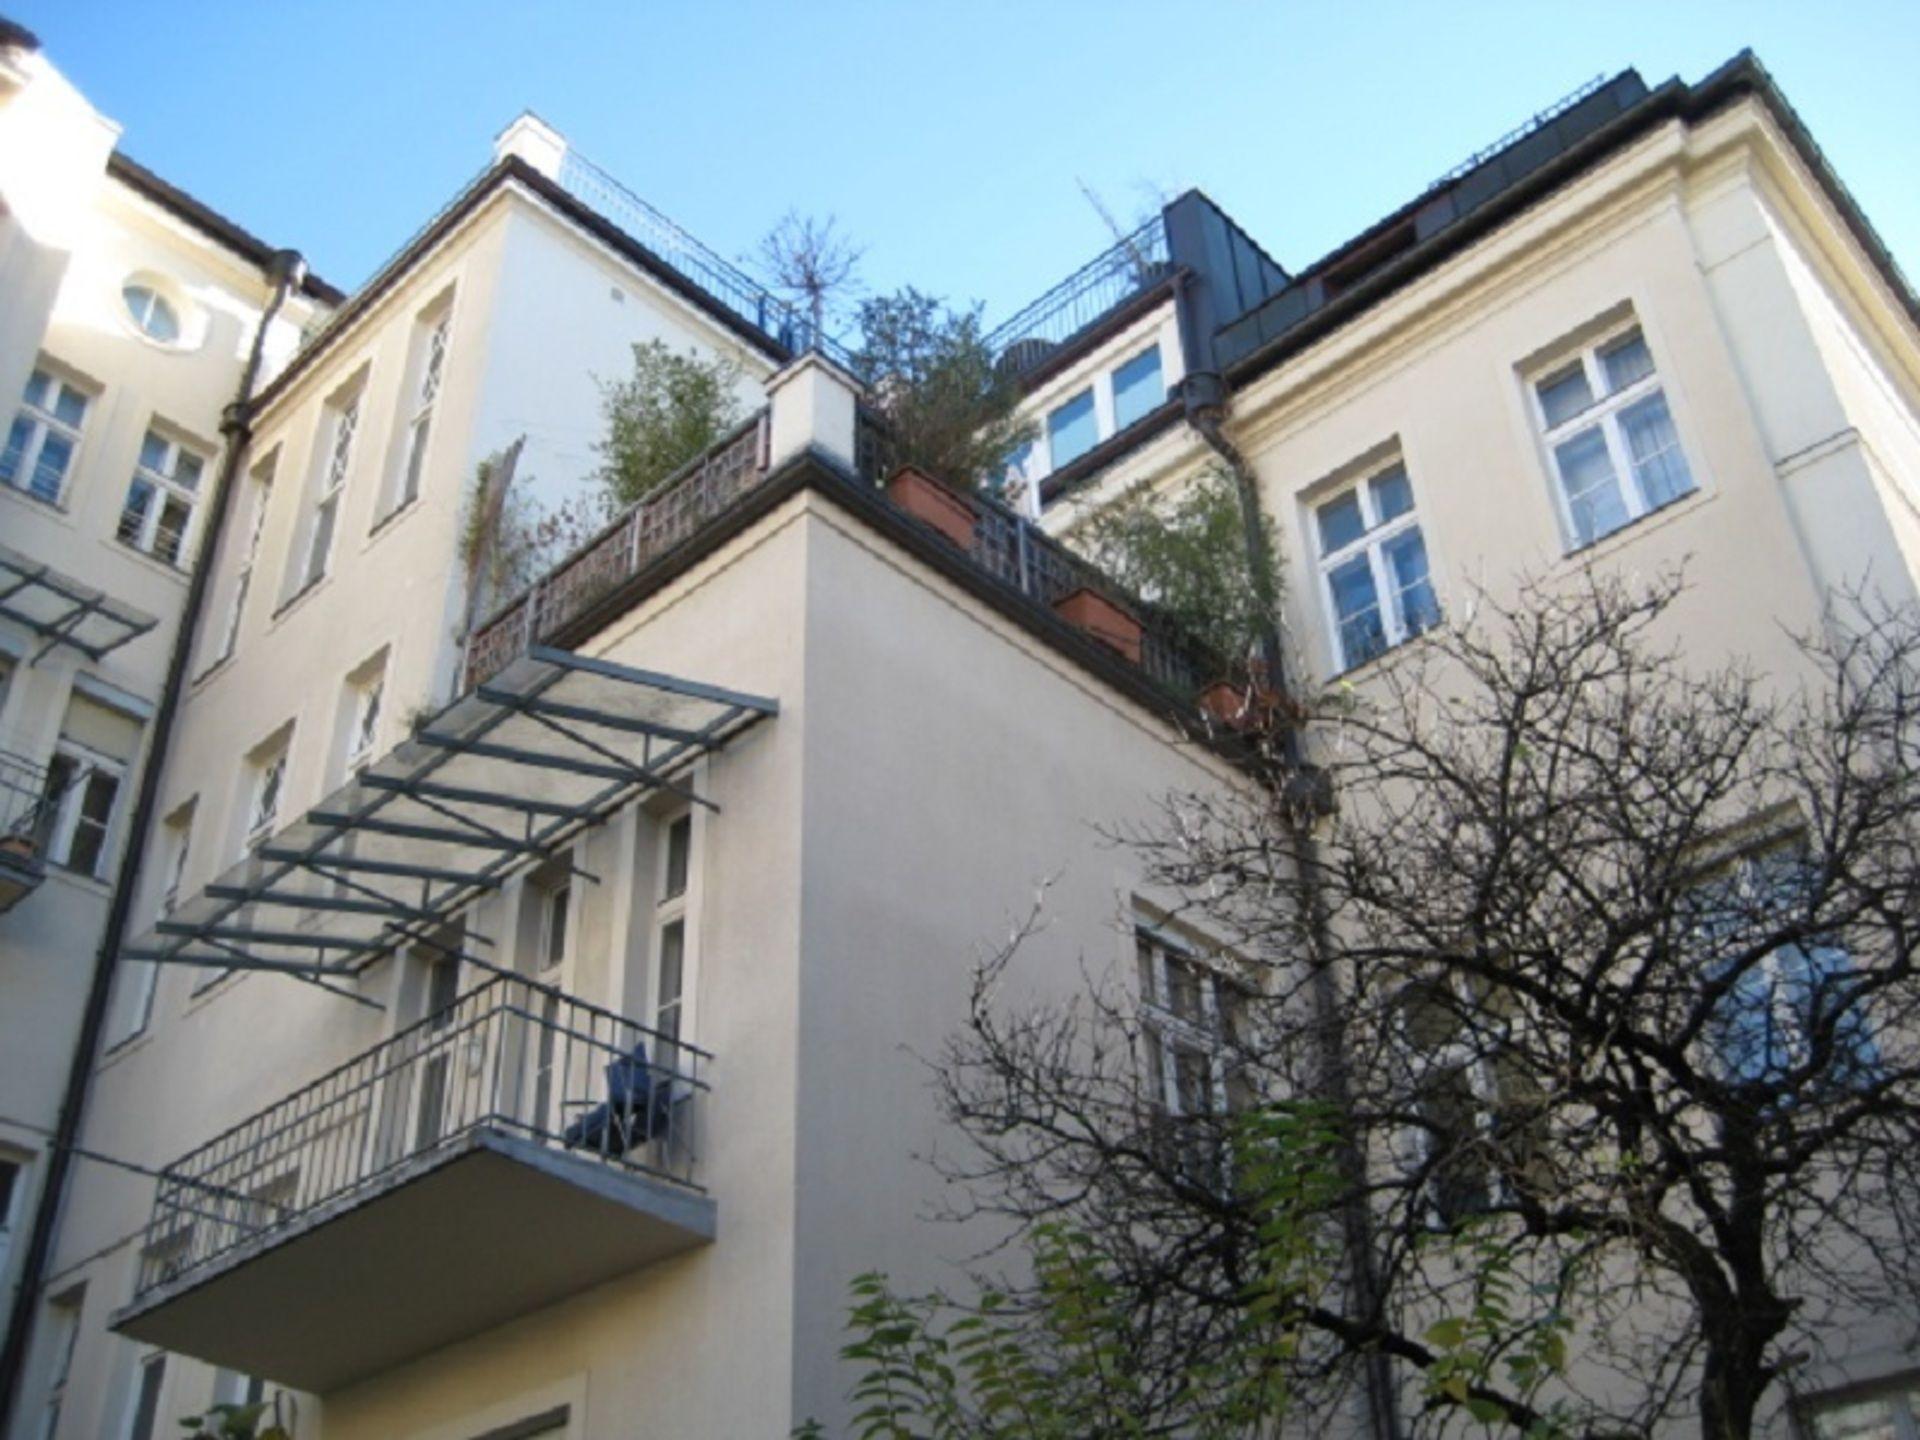 Paris-Lodron-Straße 3a, 5020 Salzburg